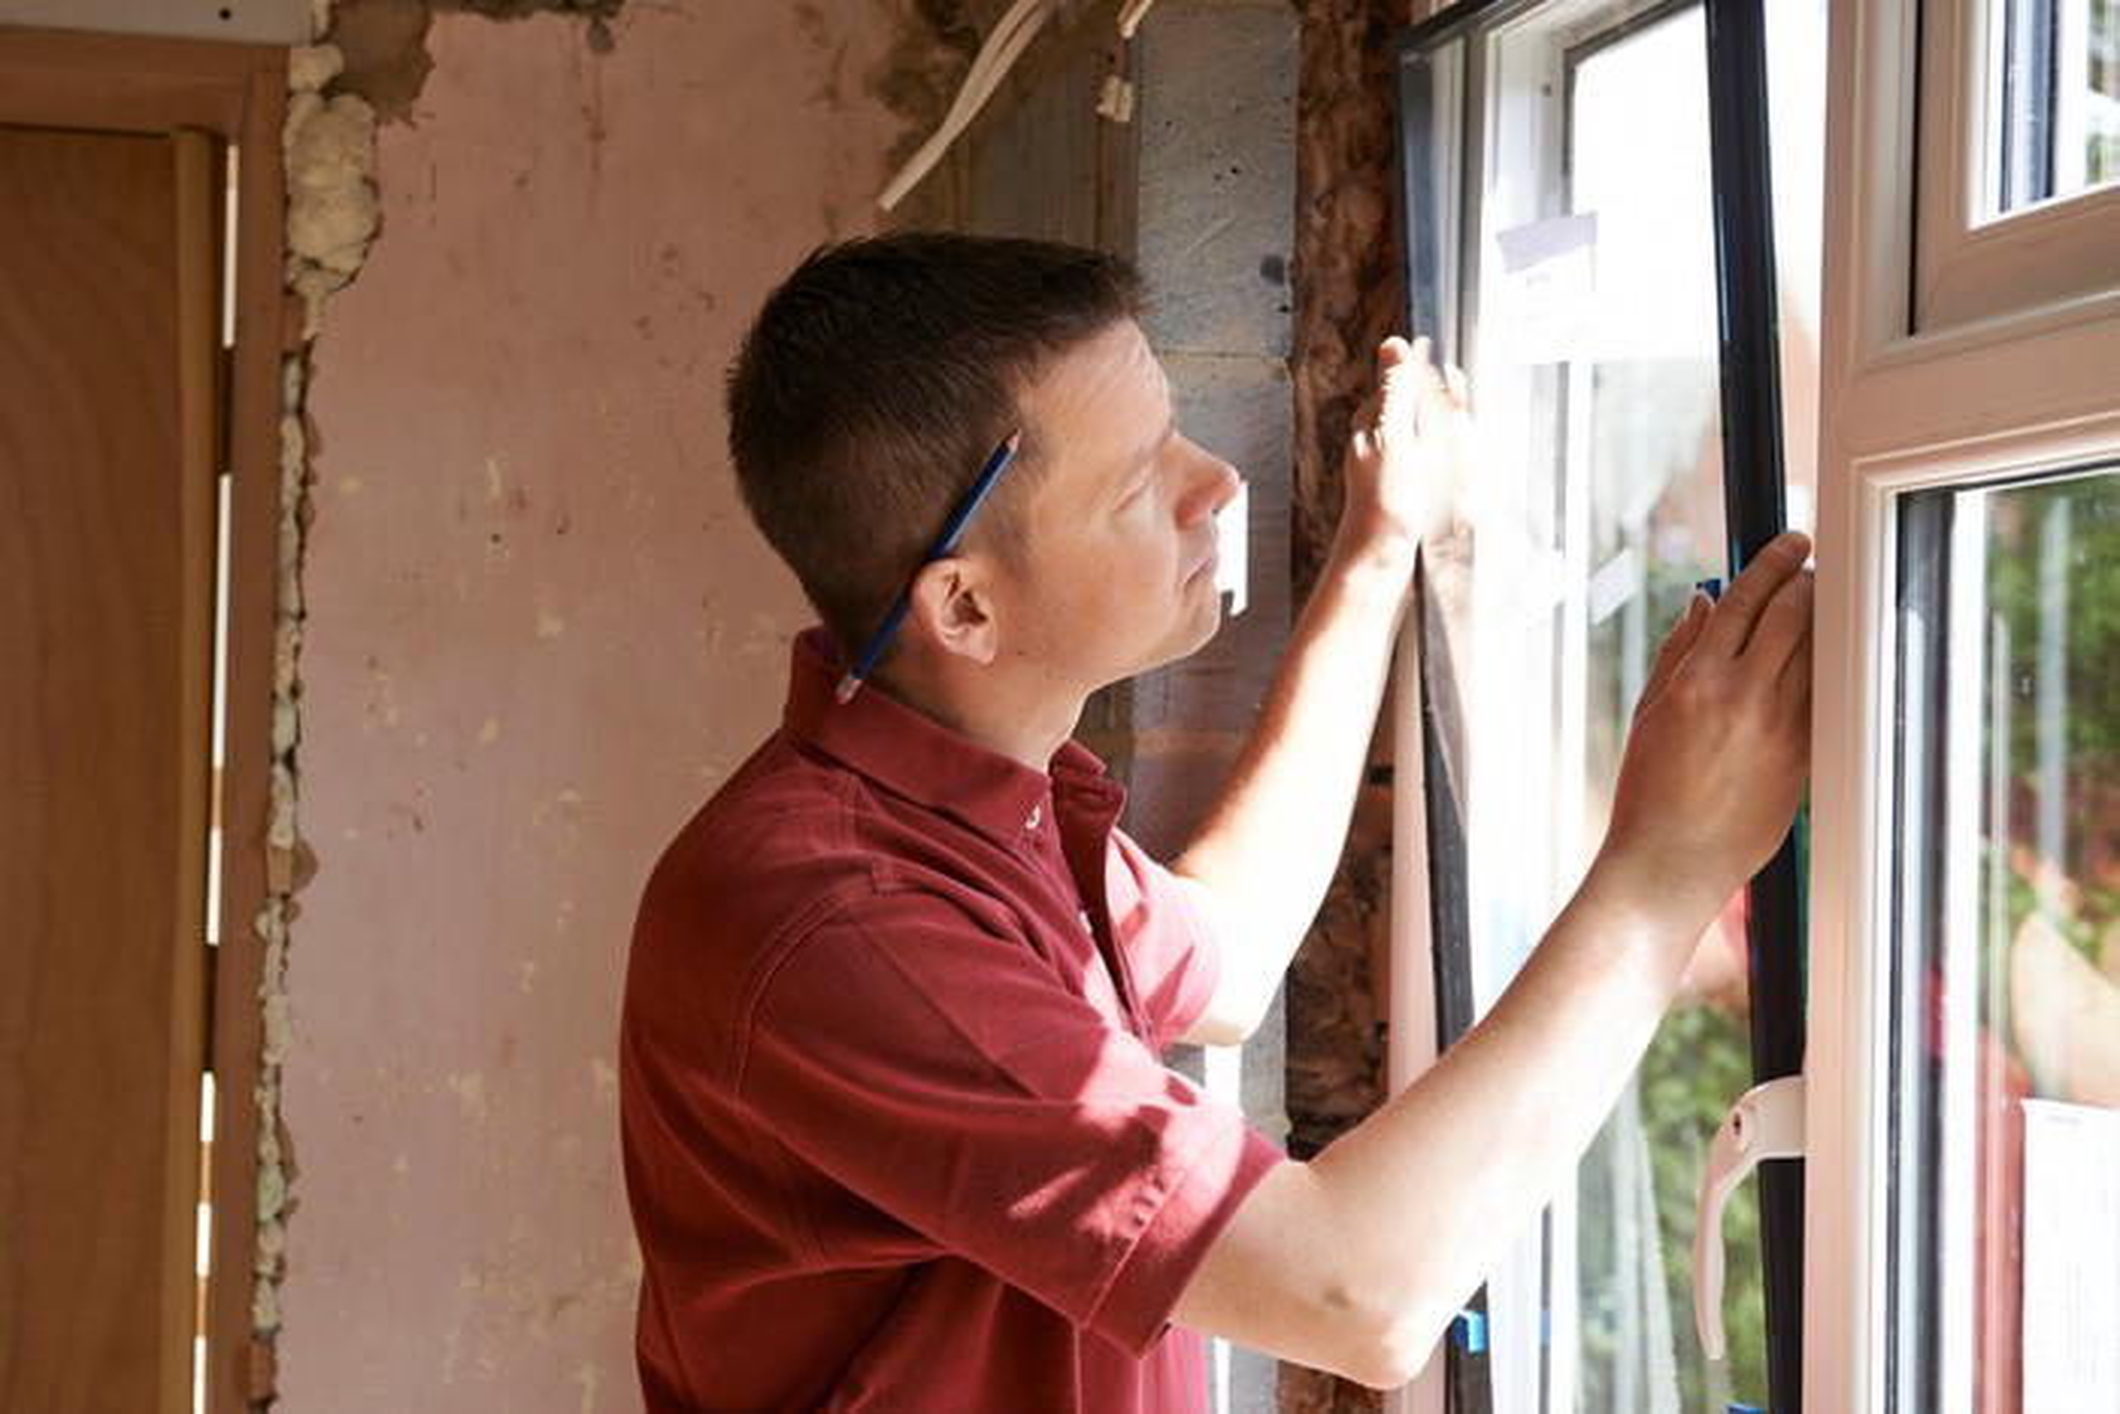 A man installing a window.